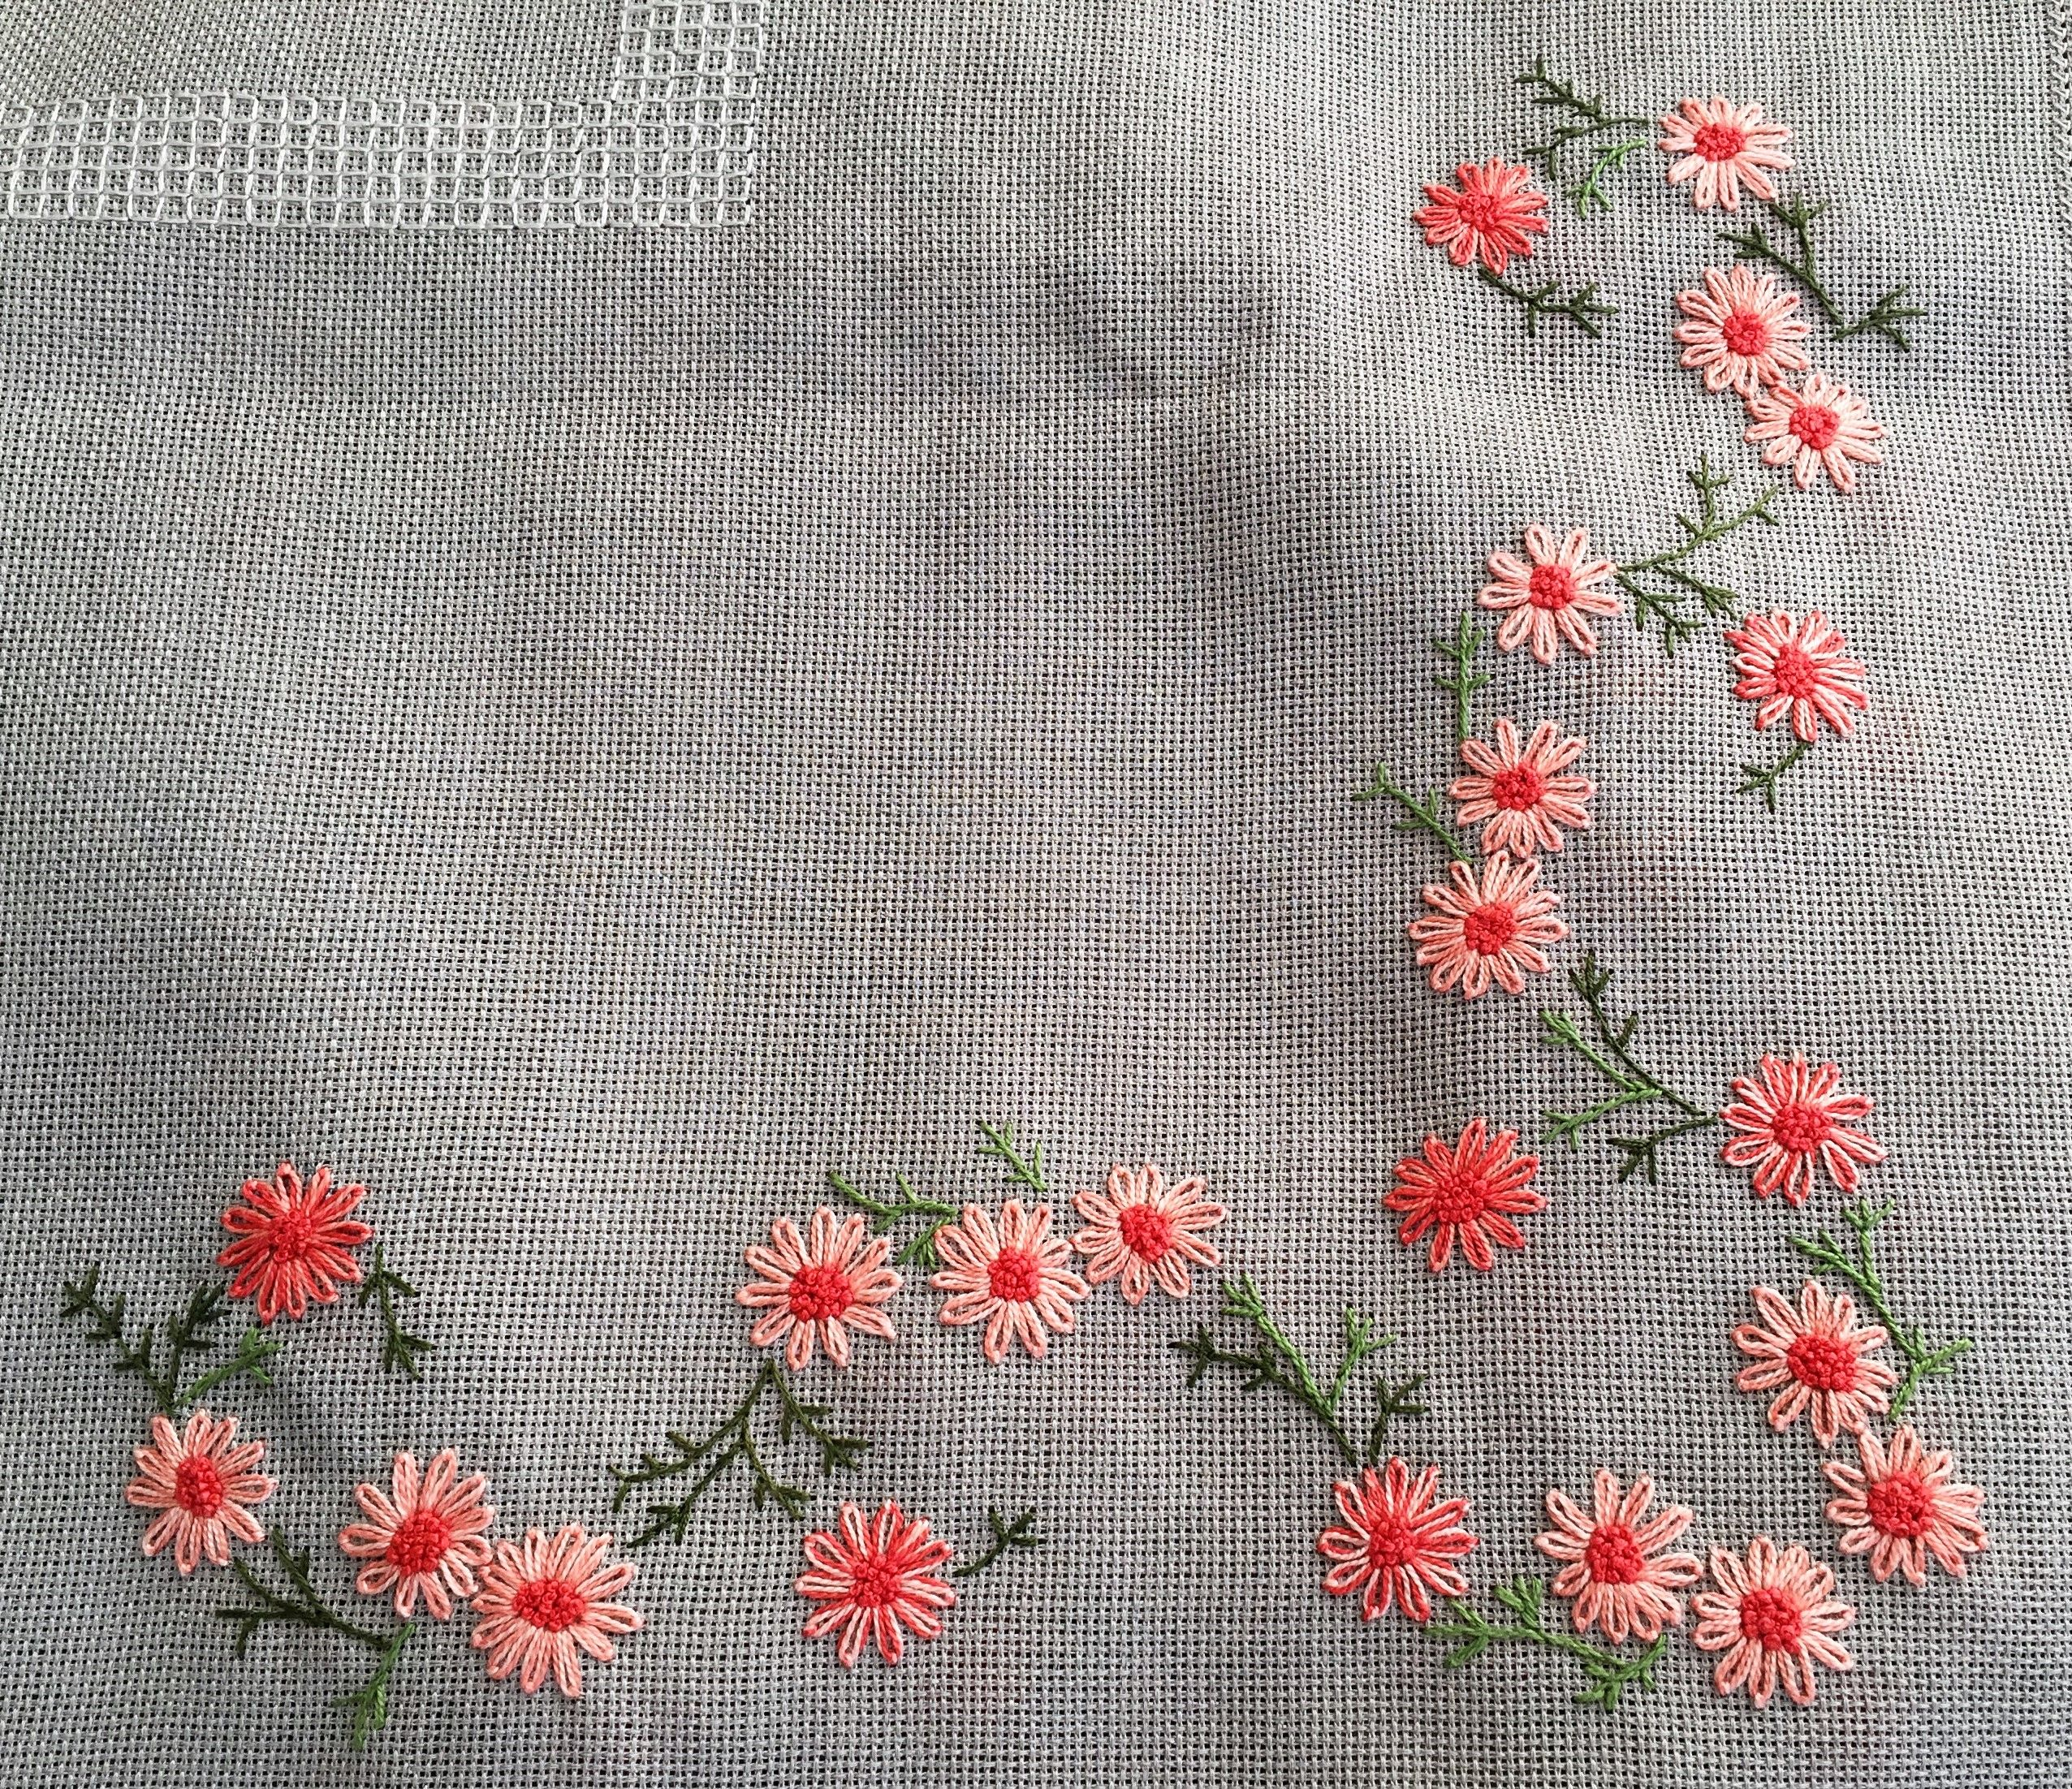 Fcaeacffddcbeg embroidery